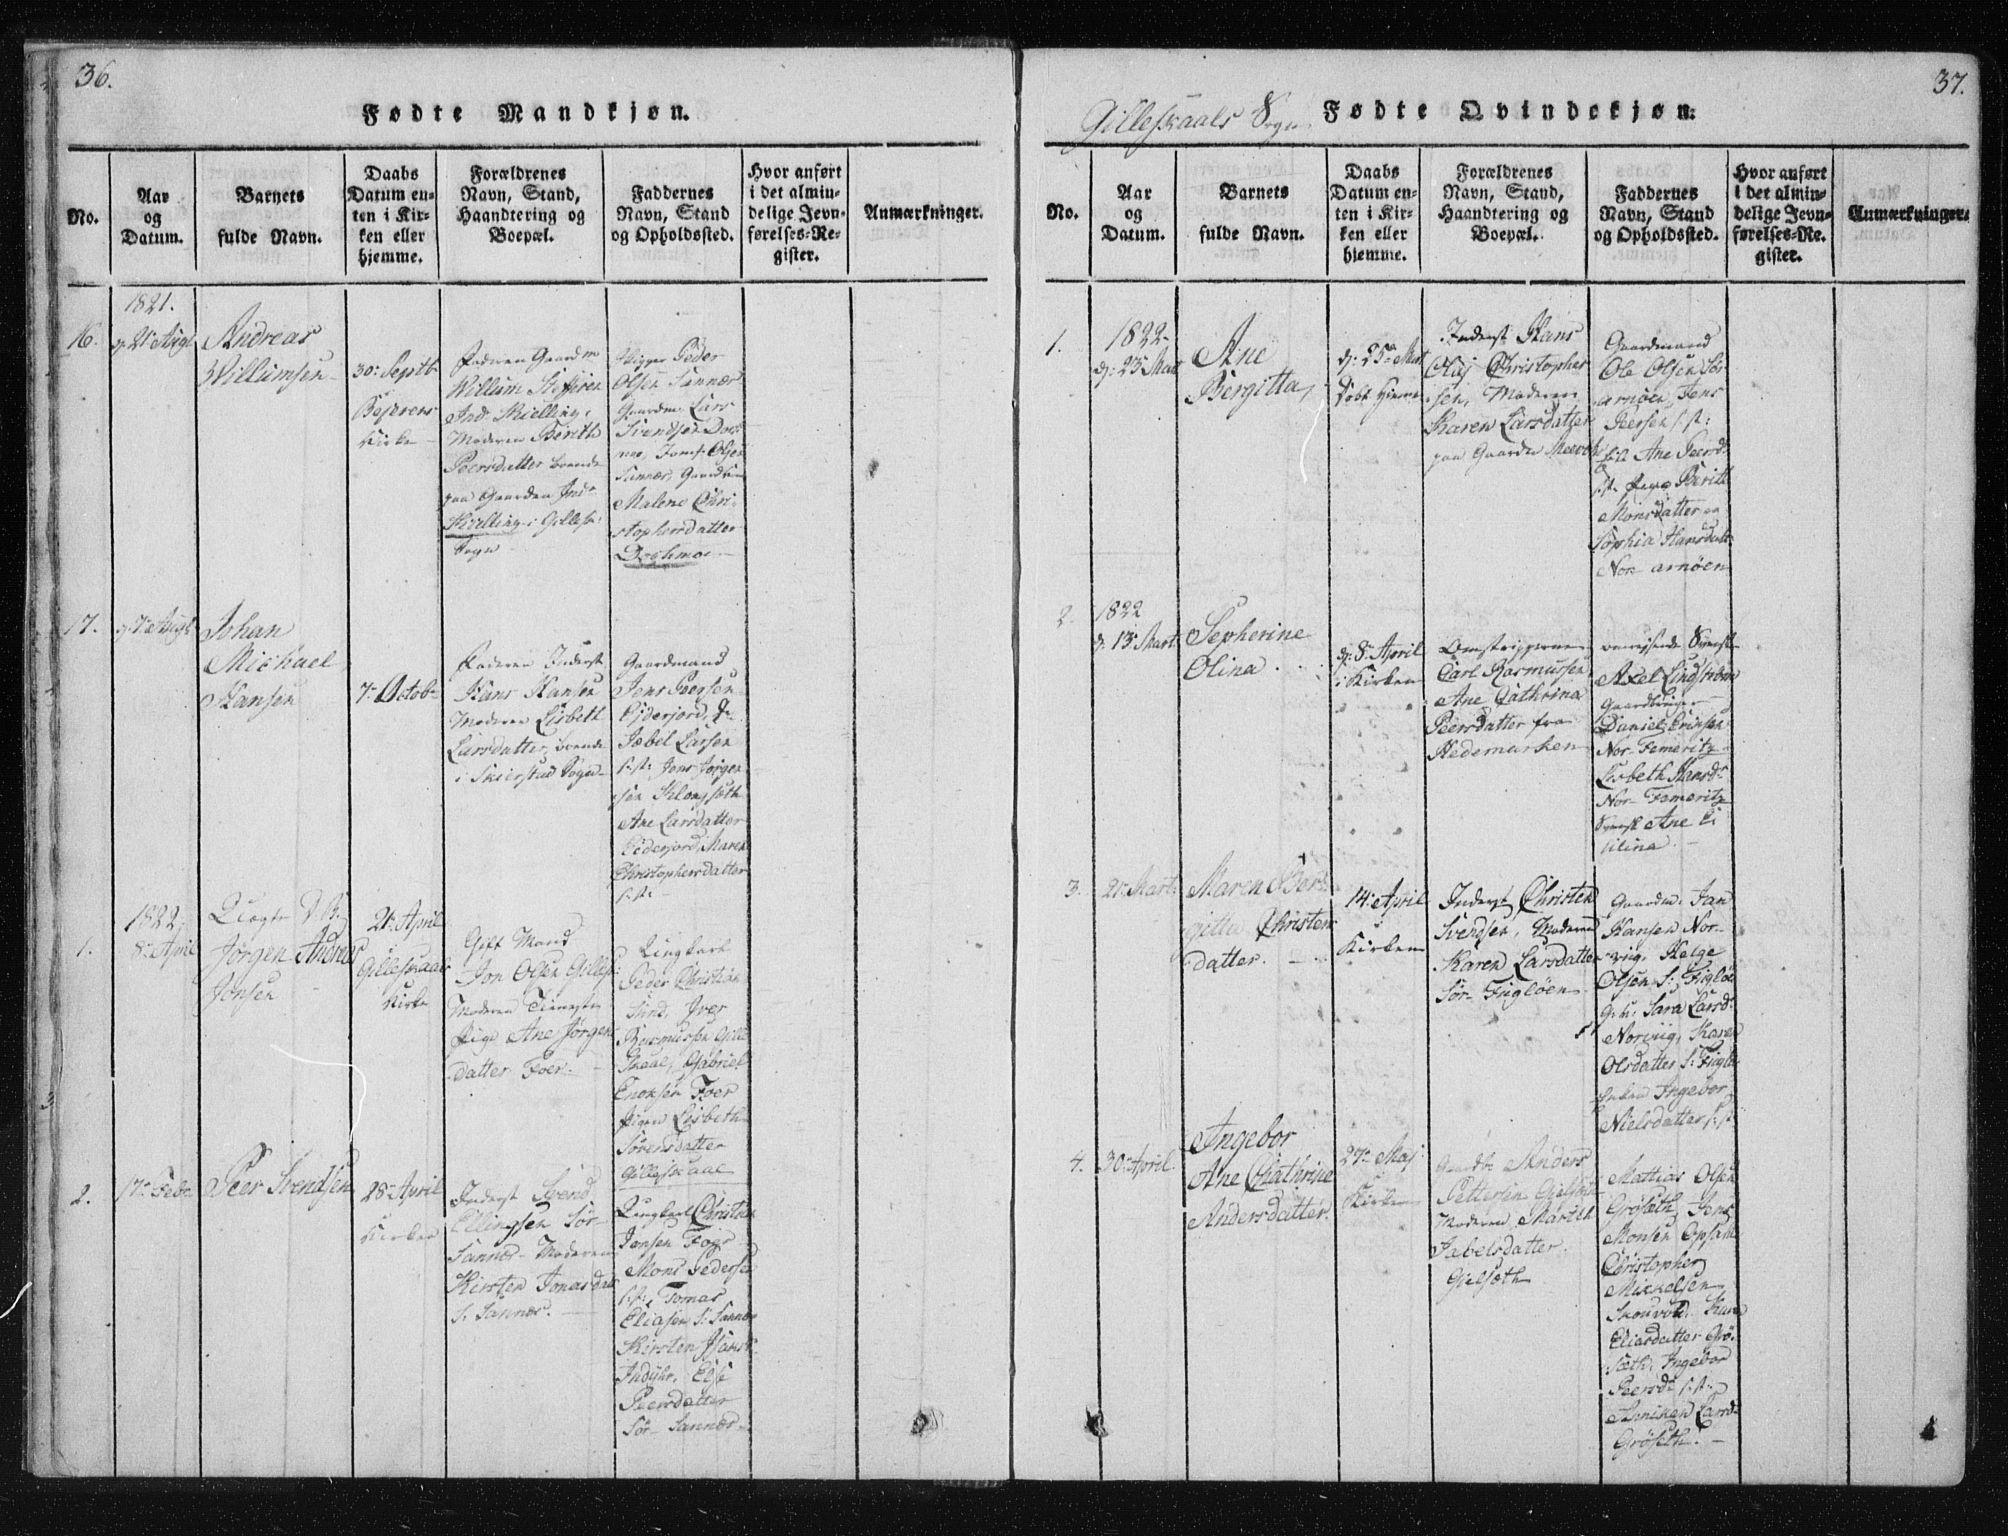 SAT, Ministerialprotokoller, klokkerbøker og fødselsregistre - Nordland, 805/L0096: Ministerialbok nr. 805A03, 1820-1837, s. 36-37